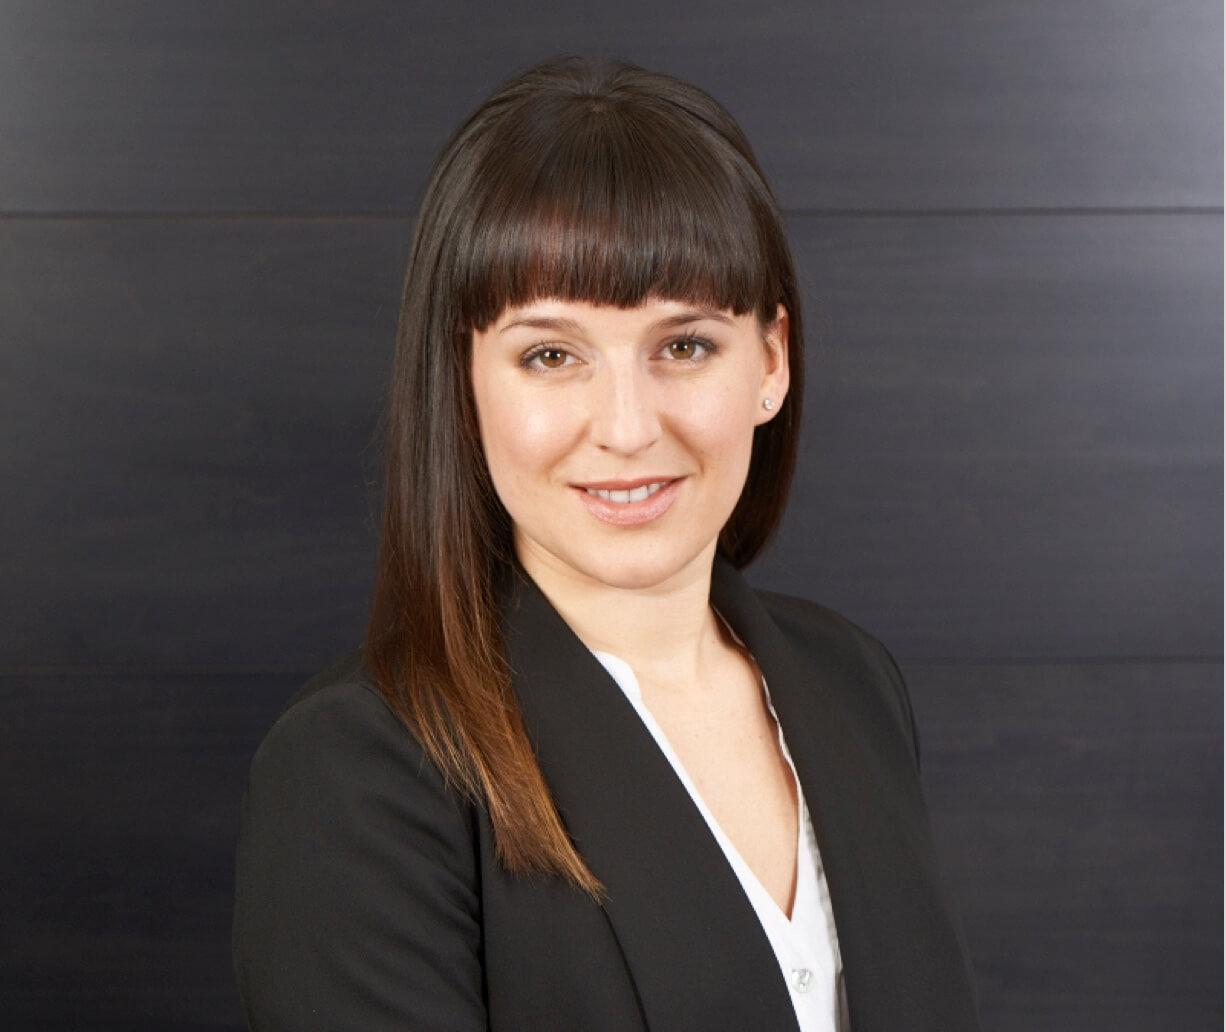 Lidija Bisak